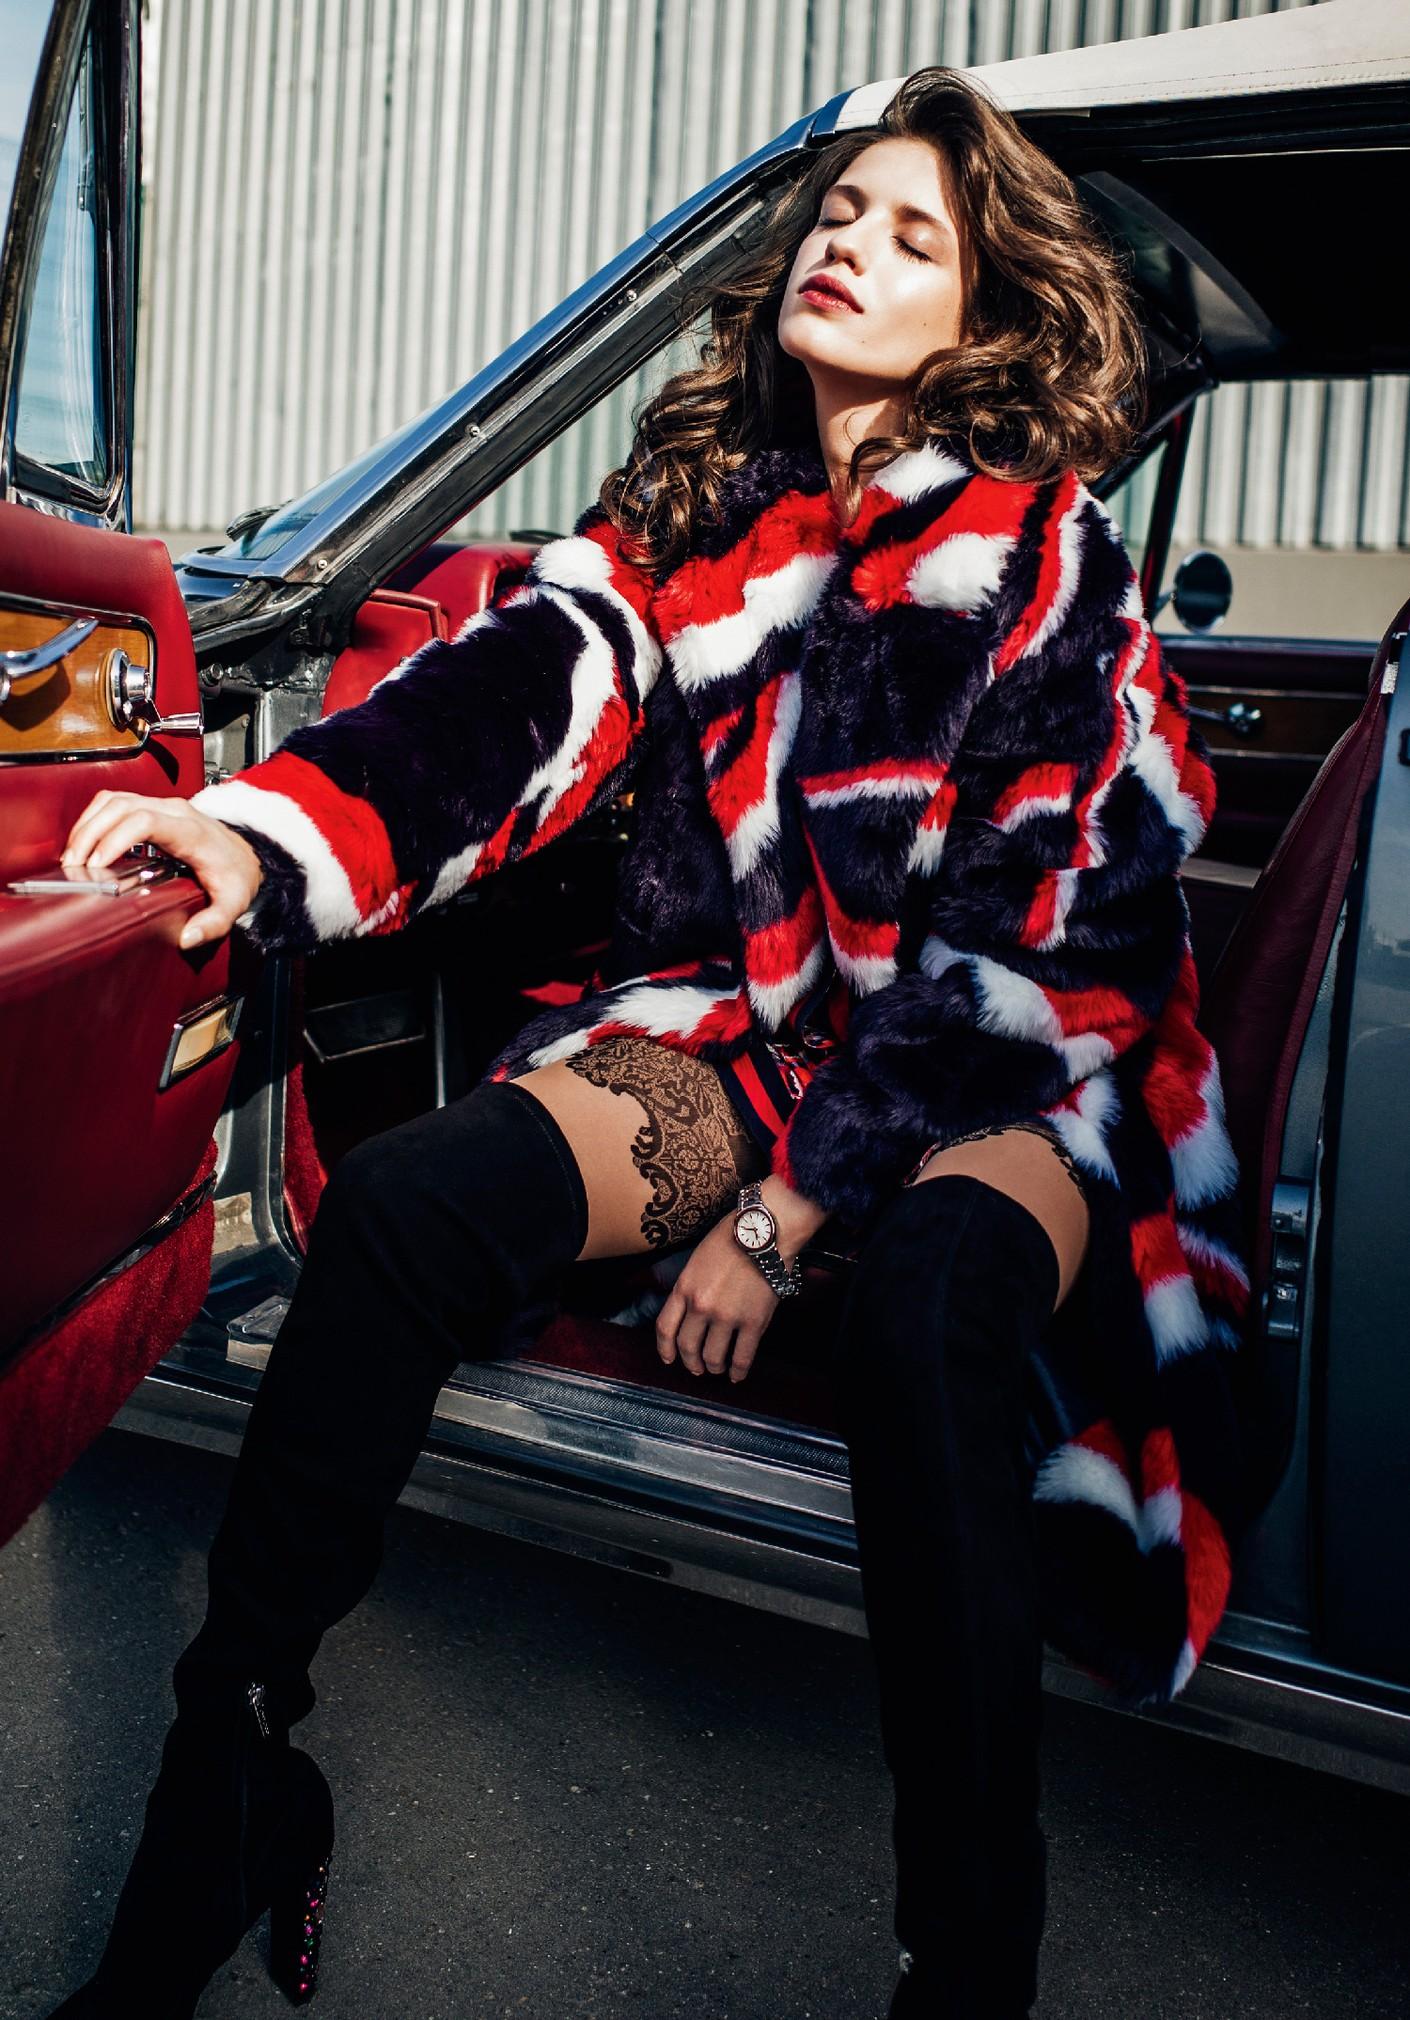 пальто Tommy Hilfiger,  блуза Gucci, колготки Falke, ботфорты Jimmy Choo, часы Tag Heuer Link